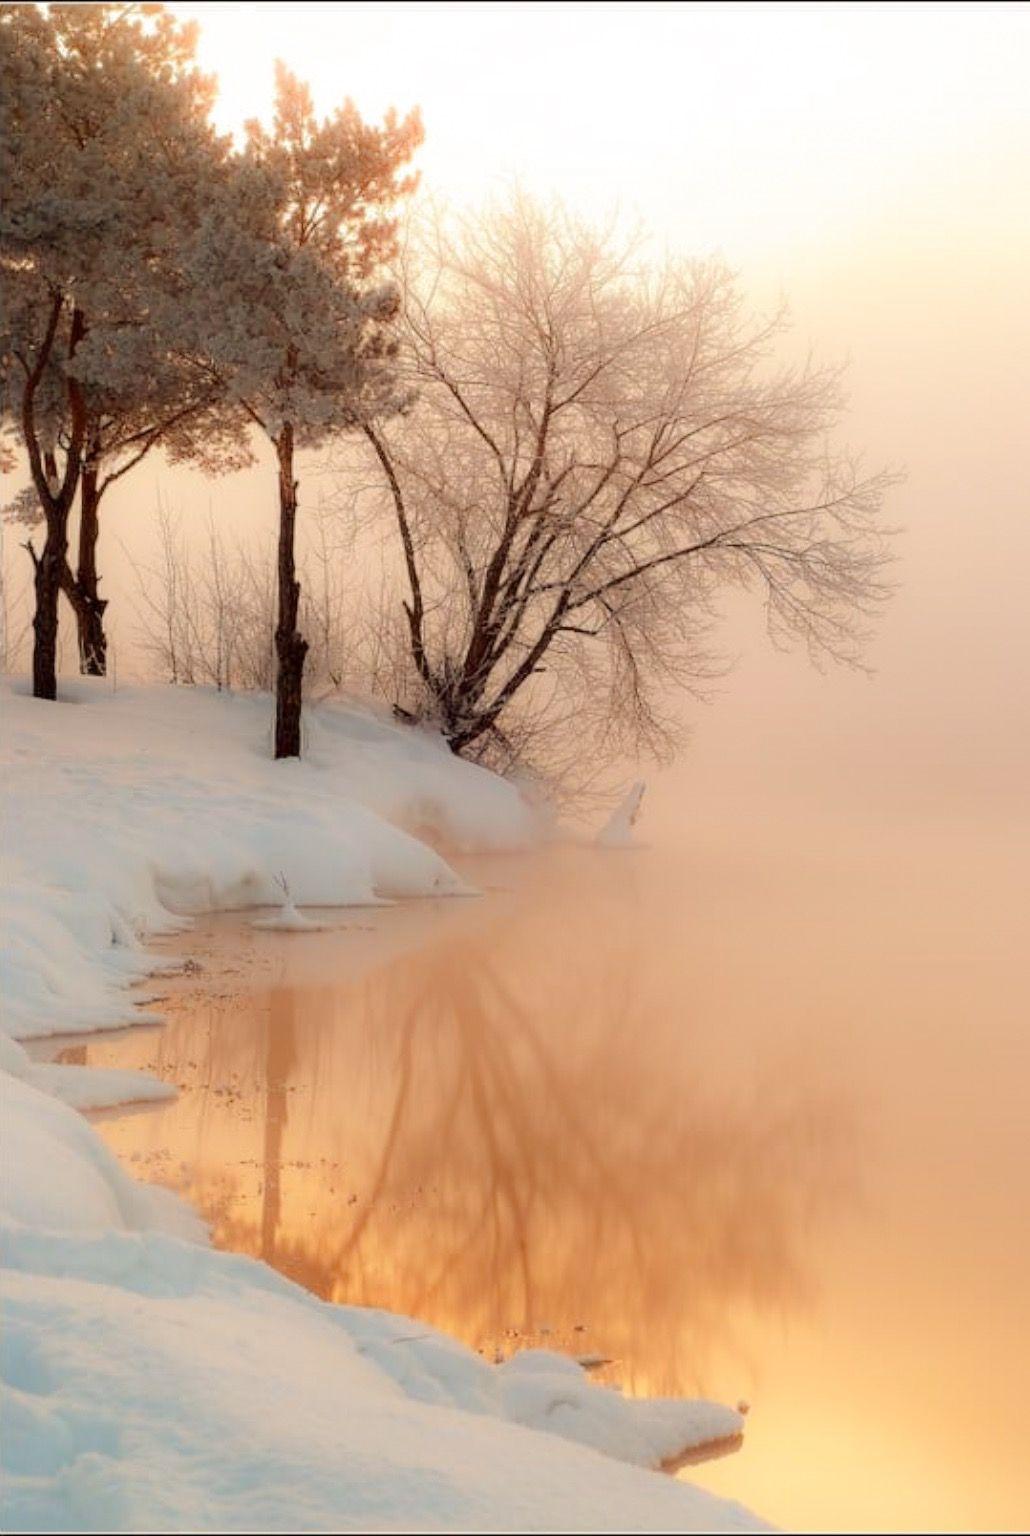 Misty Winter With Lake No Location Given By Bukenawa 500px Winter Scenery Winter Landscape Winter Scenes